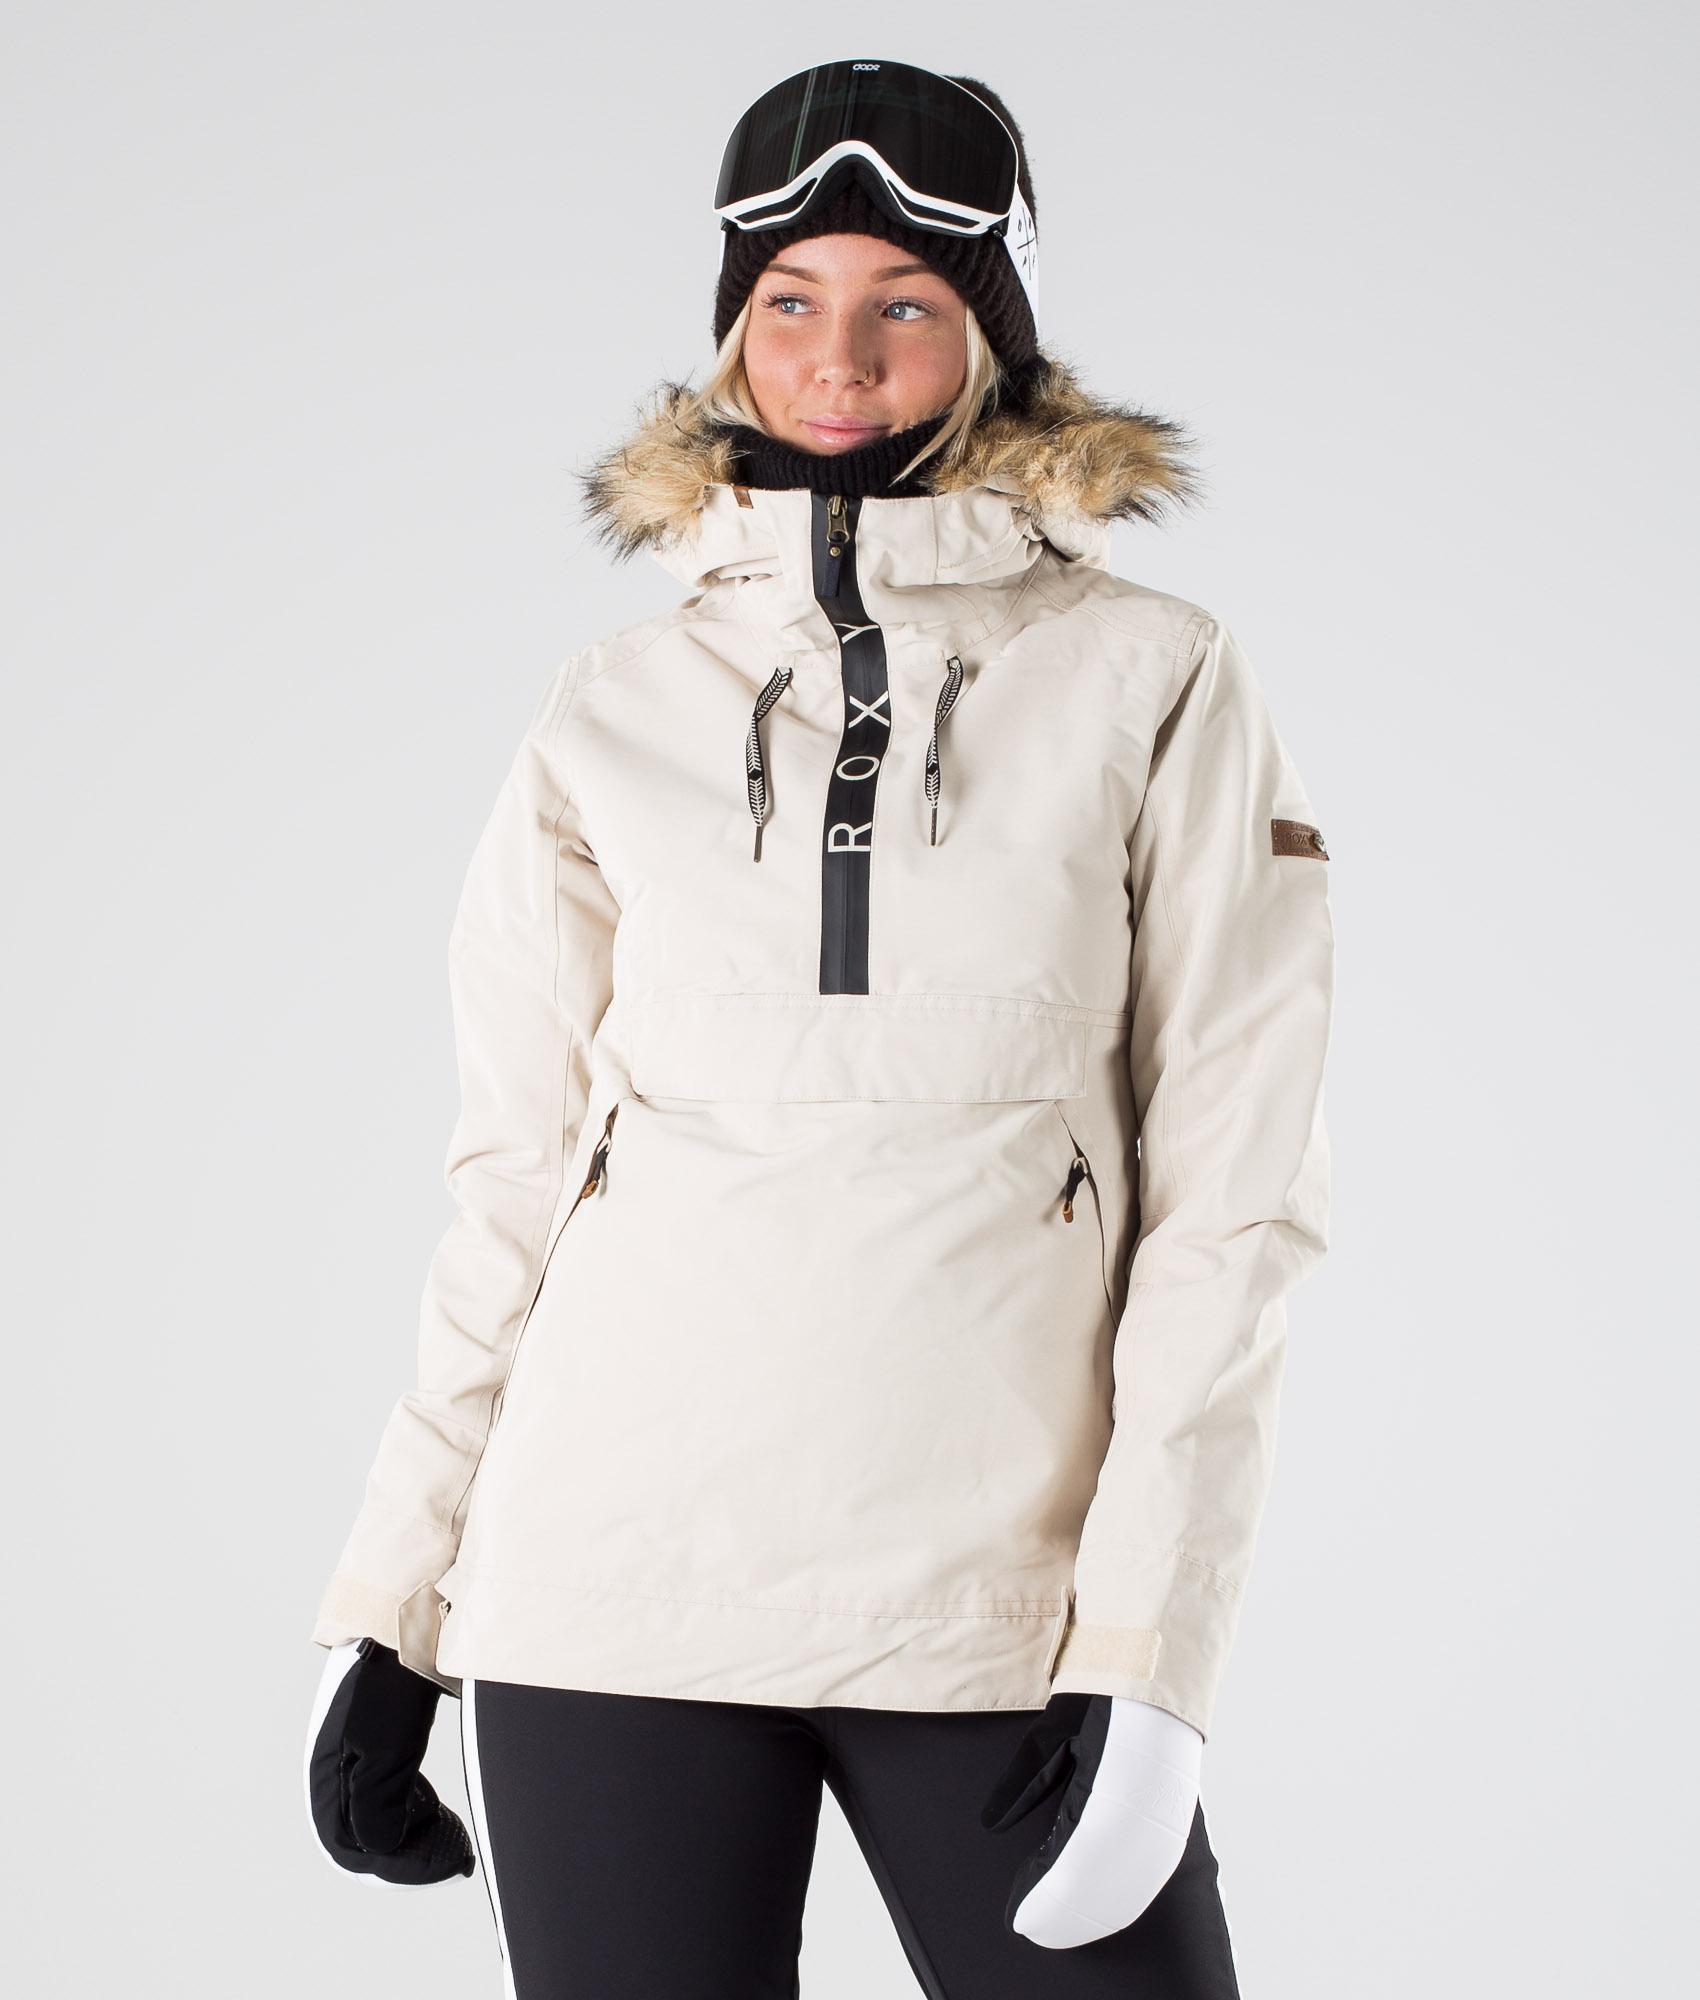 Roxy Shelter Snowboardjakke Oyster Gray Ridestore.no